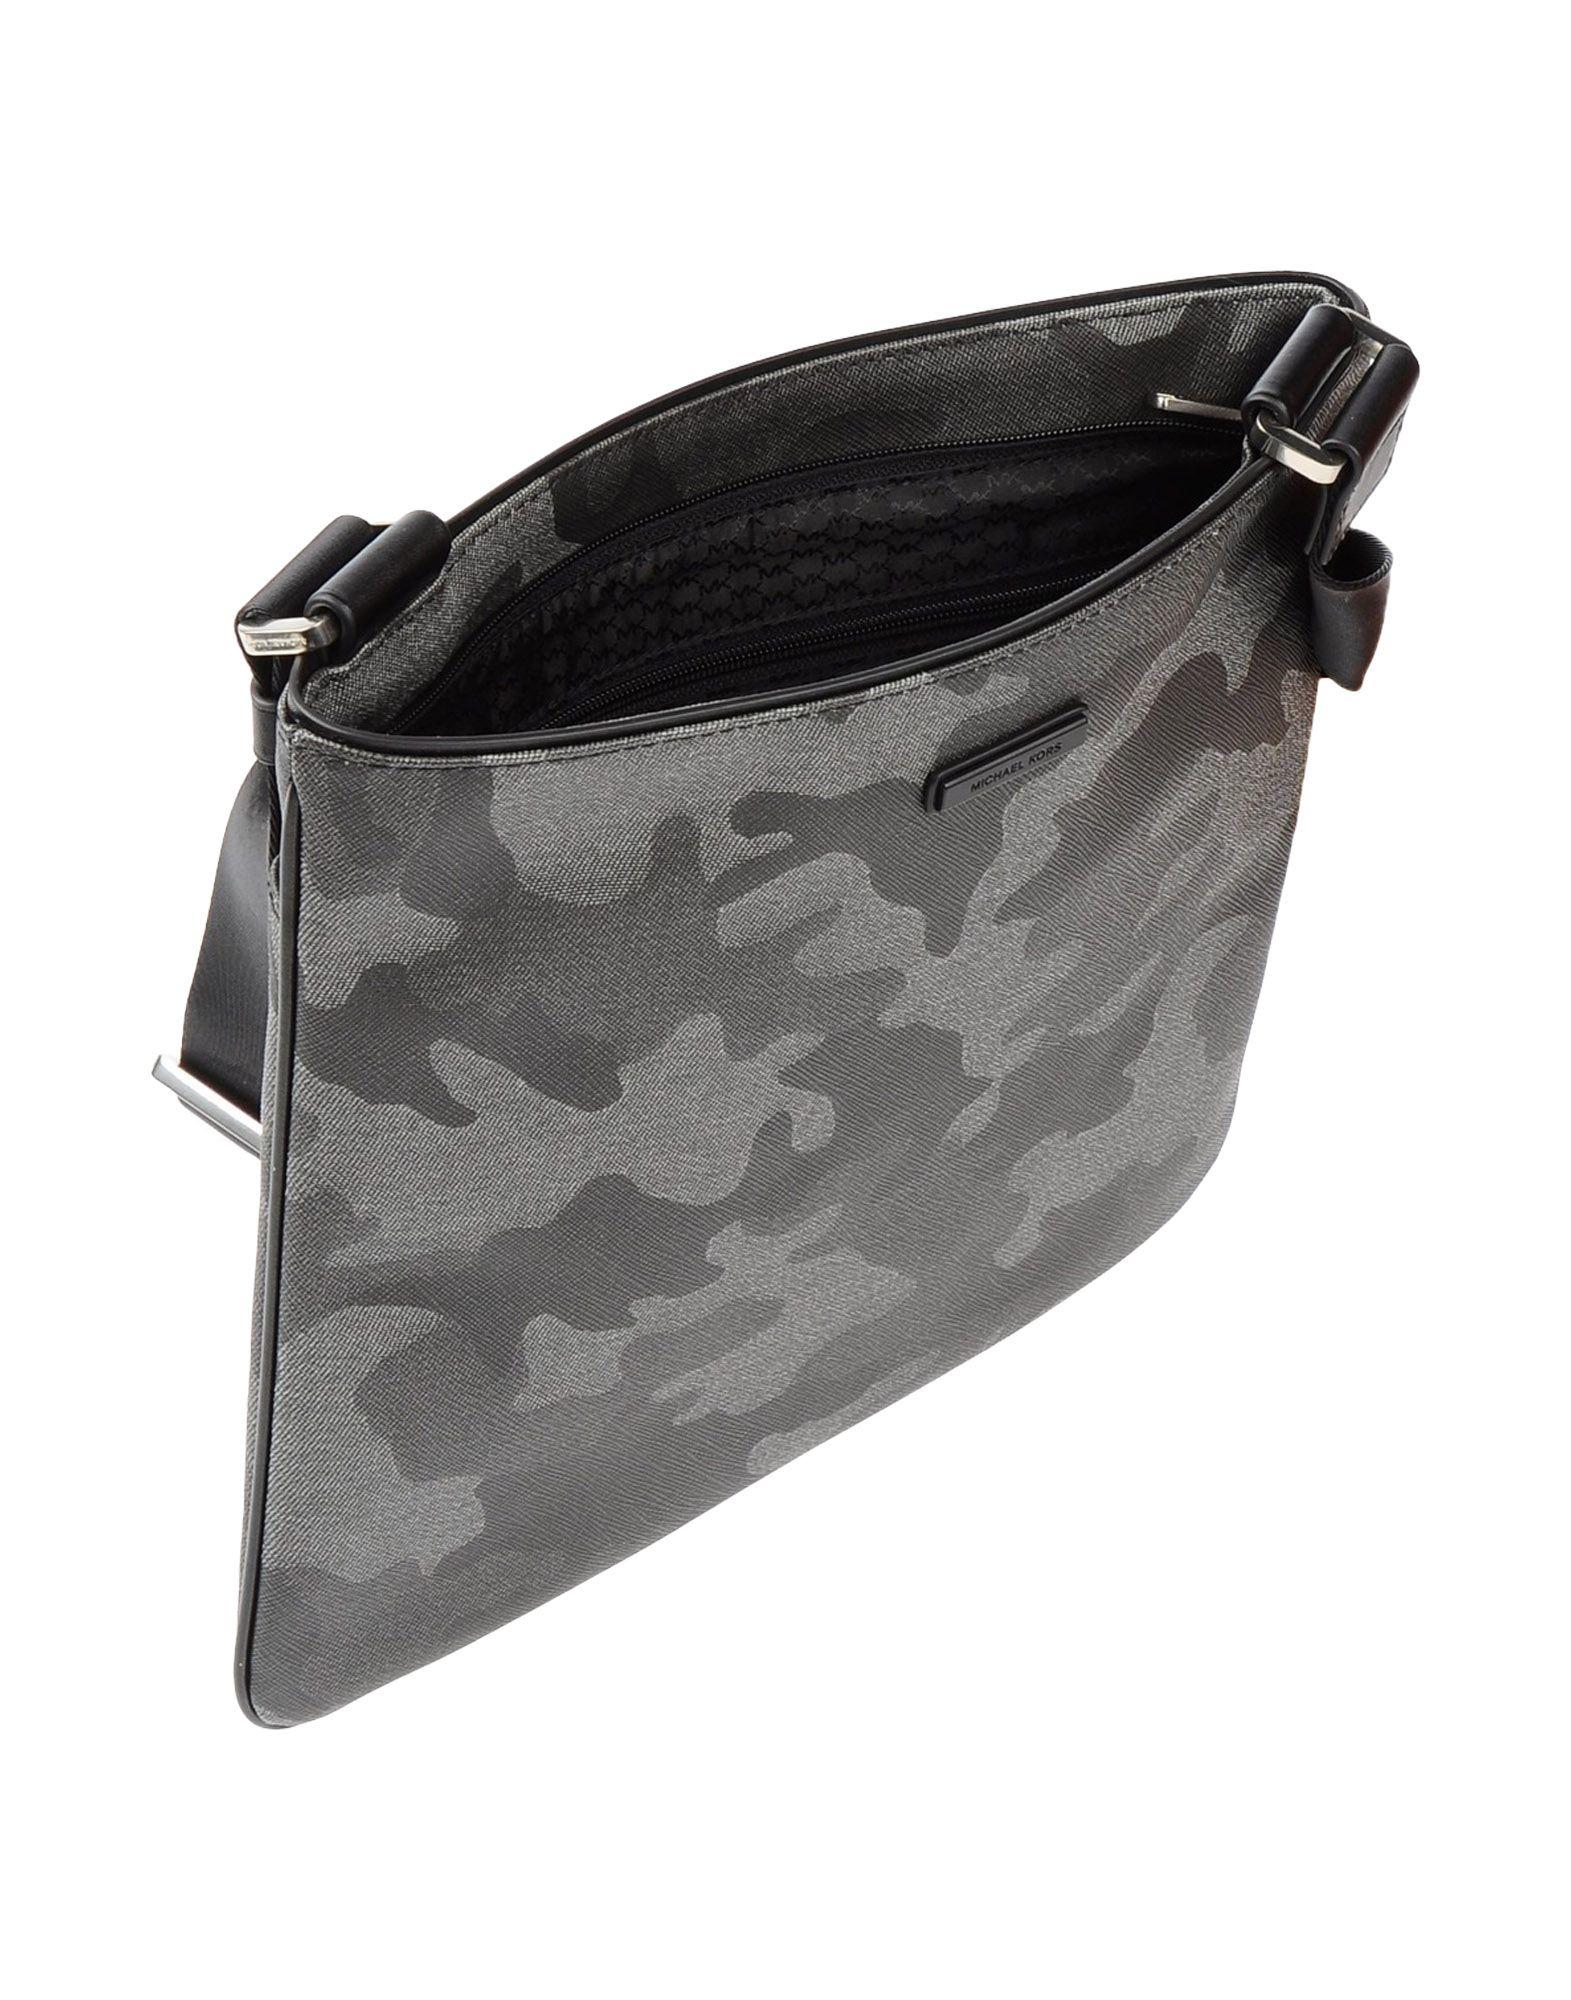 639b4b4cf8ce Lyst - Michael Kors Cross-body Bag in Gray for Men